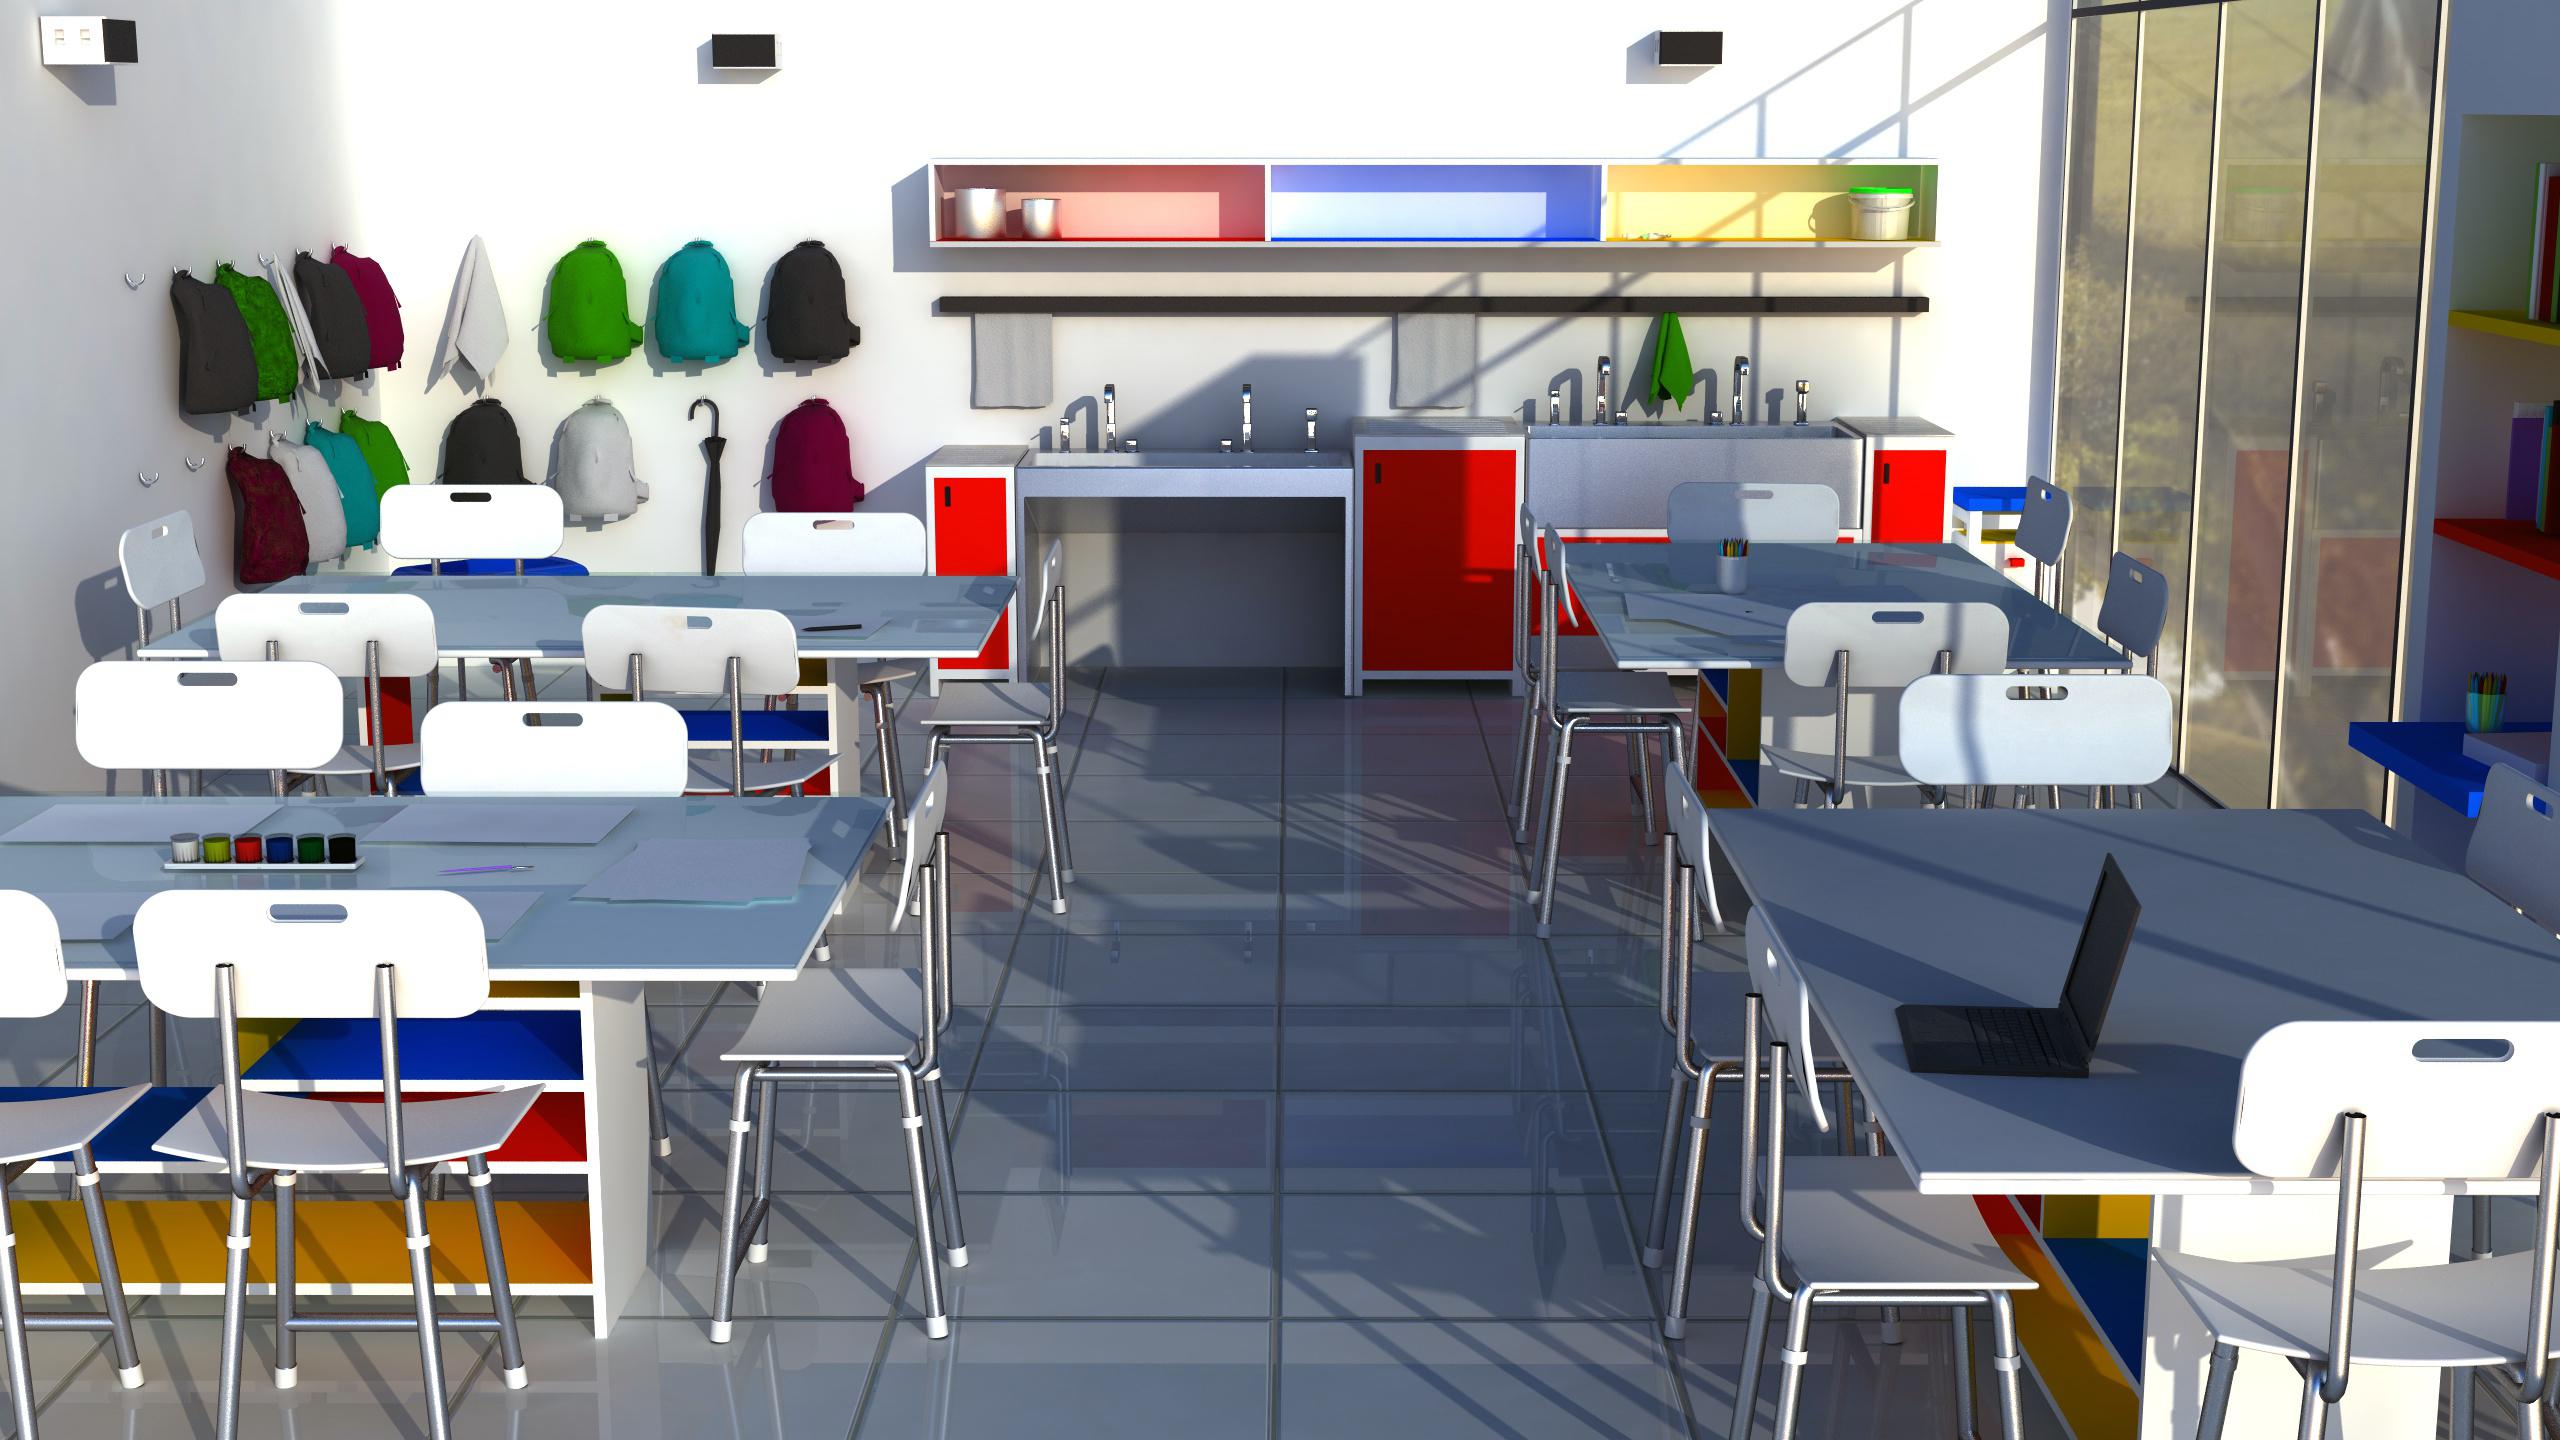 Classroom Design Concept ~ Art classroom concept by emelyjensen on deviantart